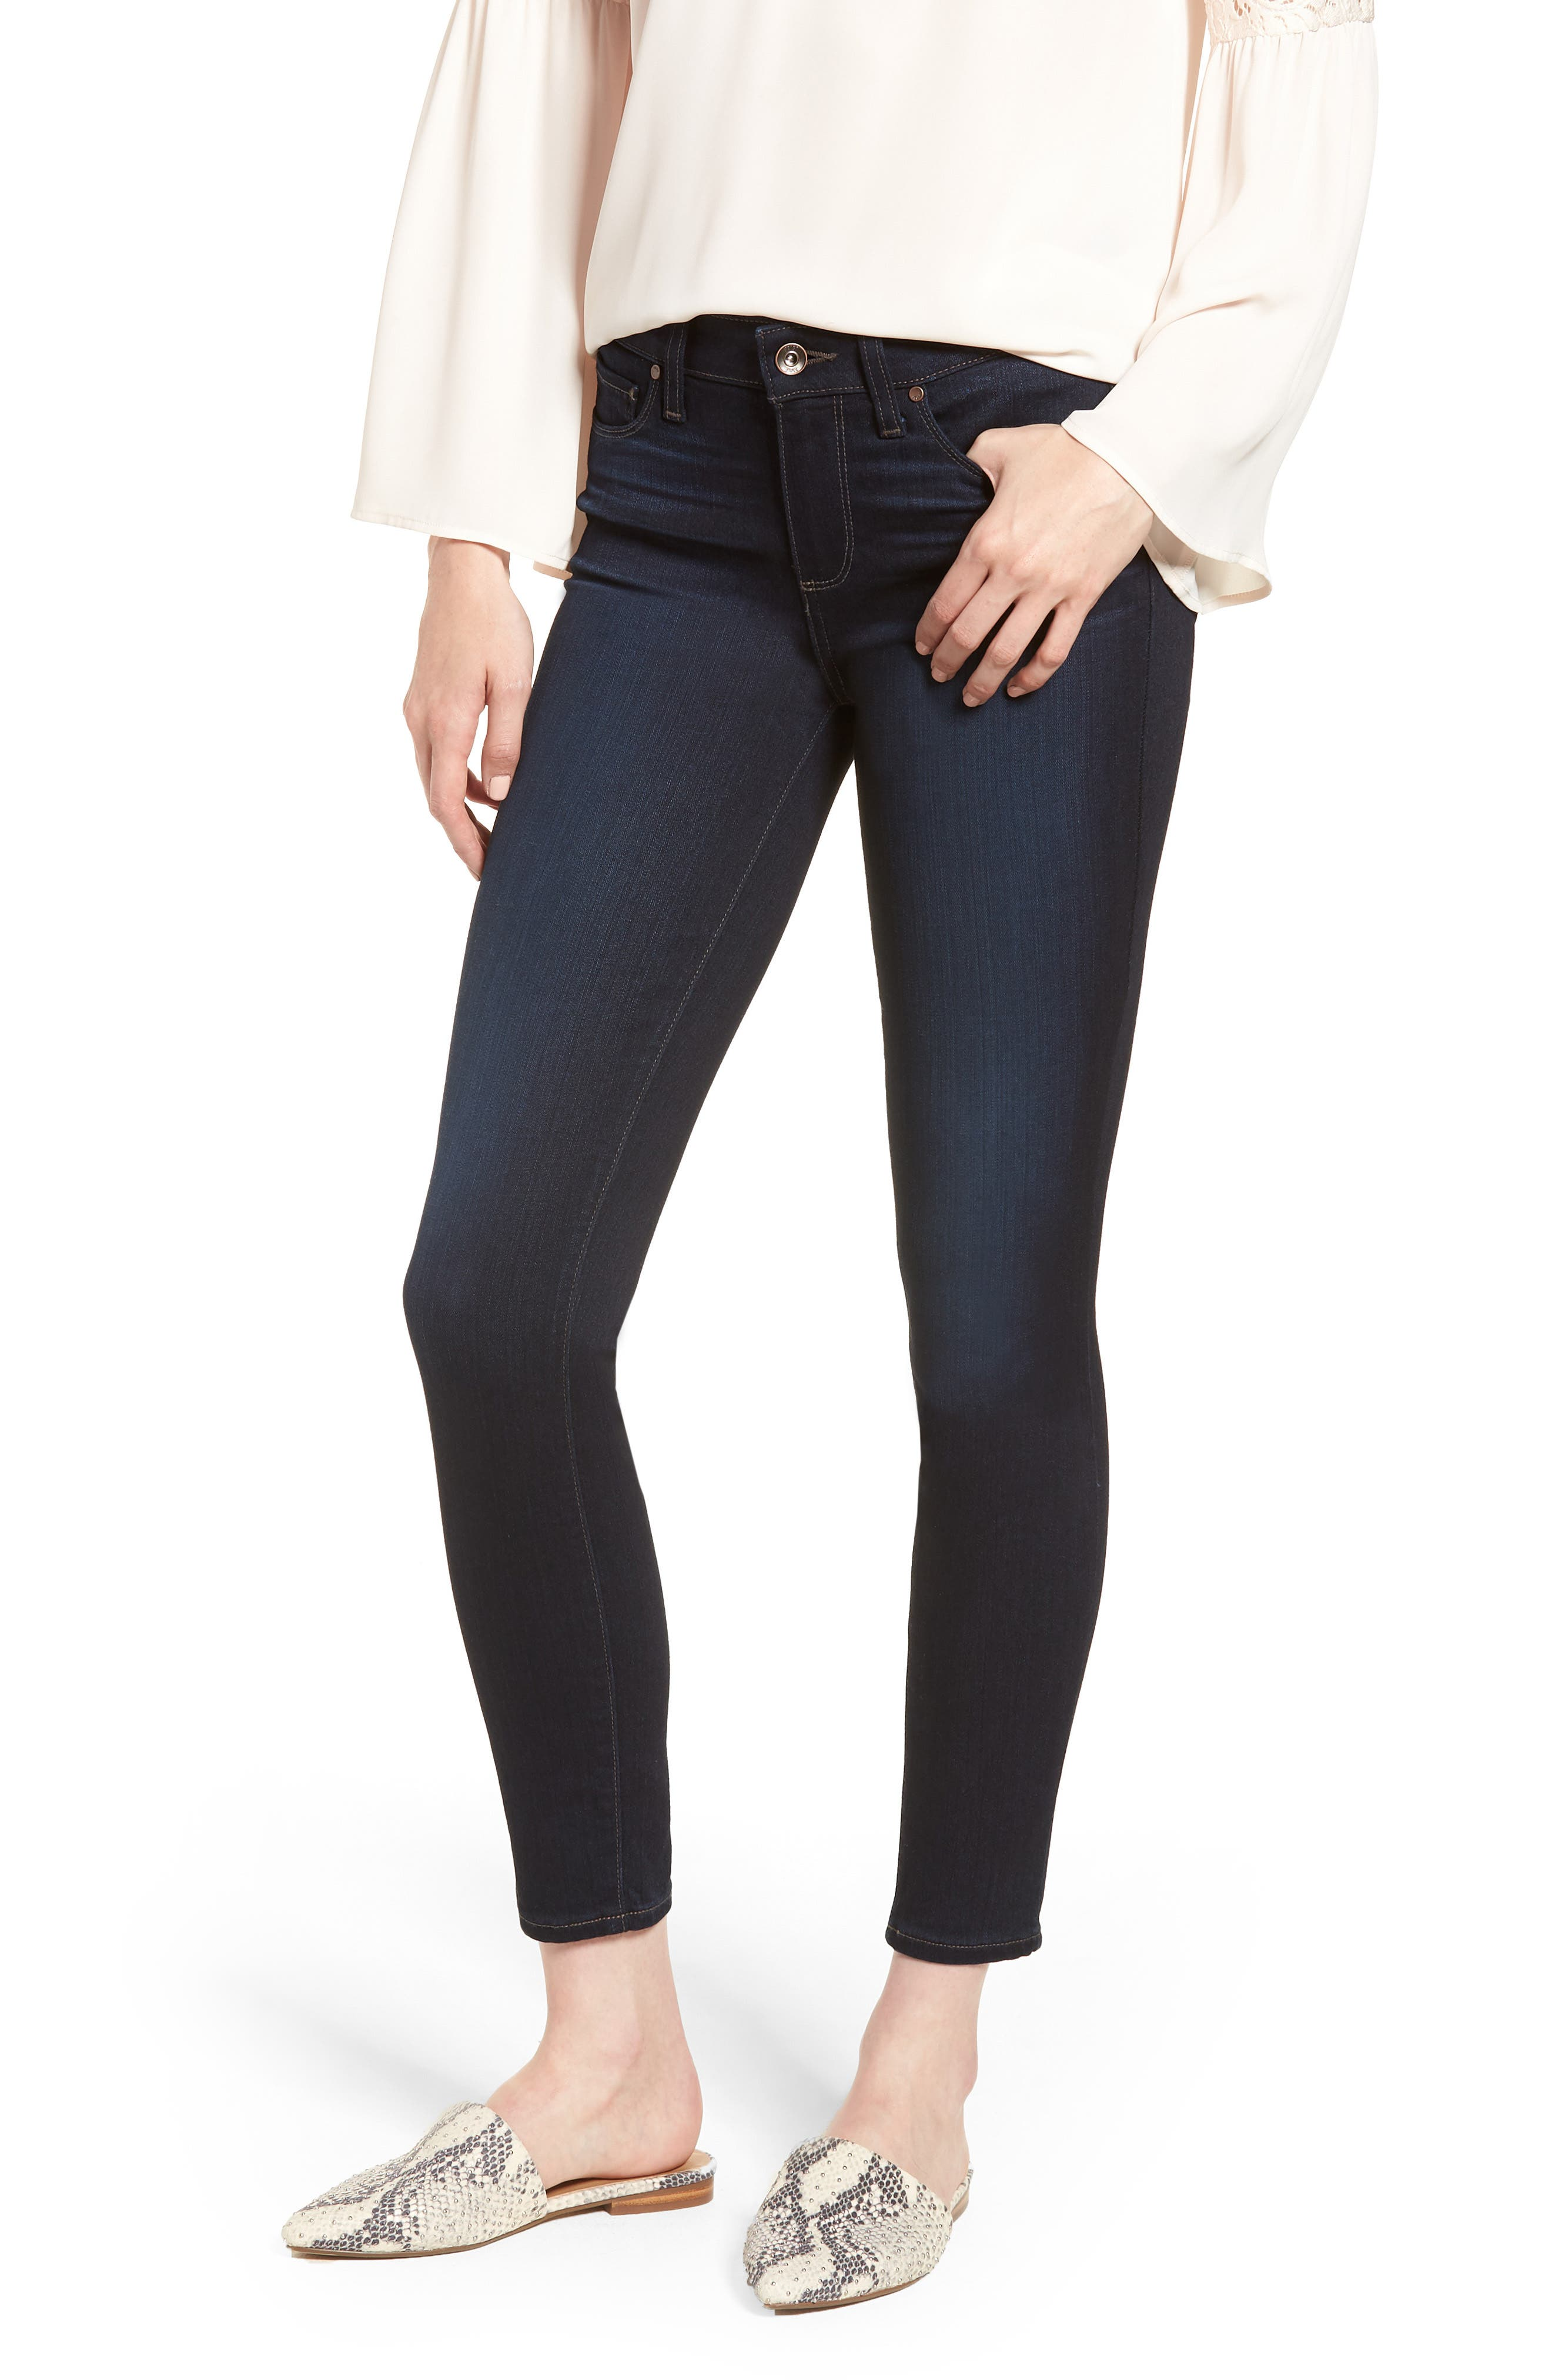 Transcend - Verdugo Ankle Skinny Jeans,                         Main,                         color, RENNA